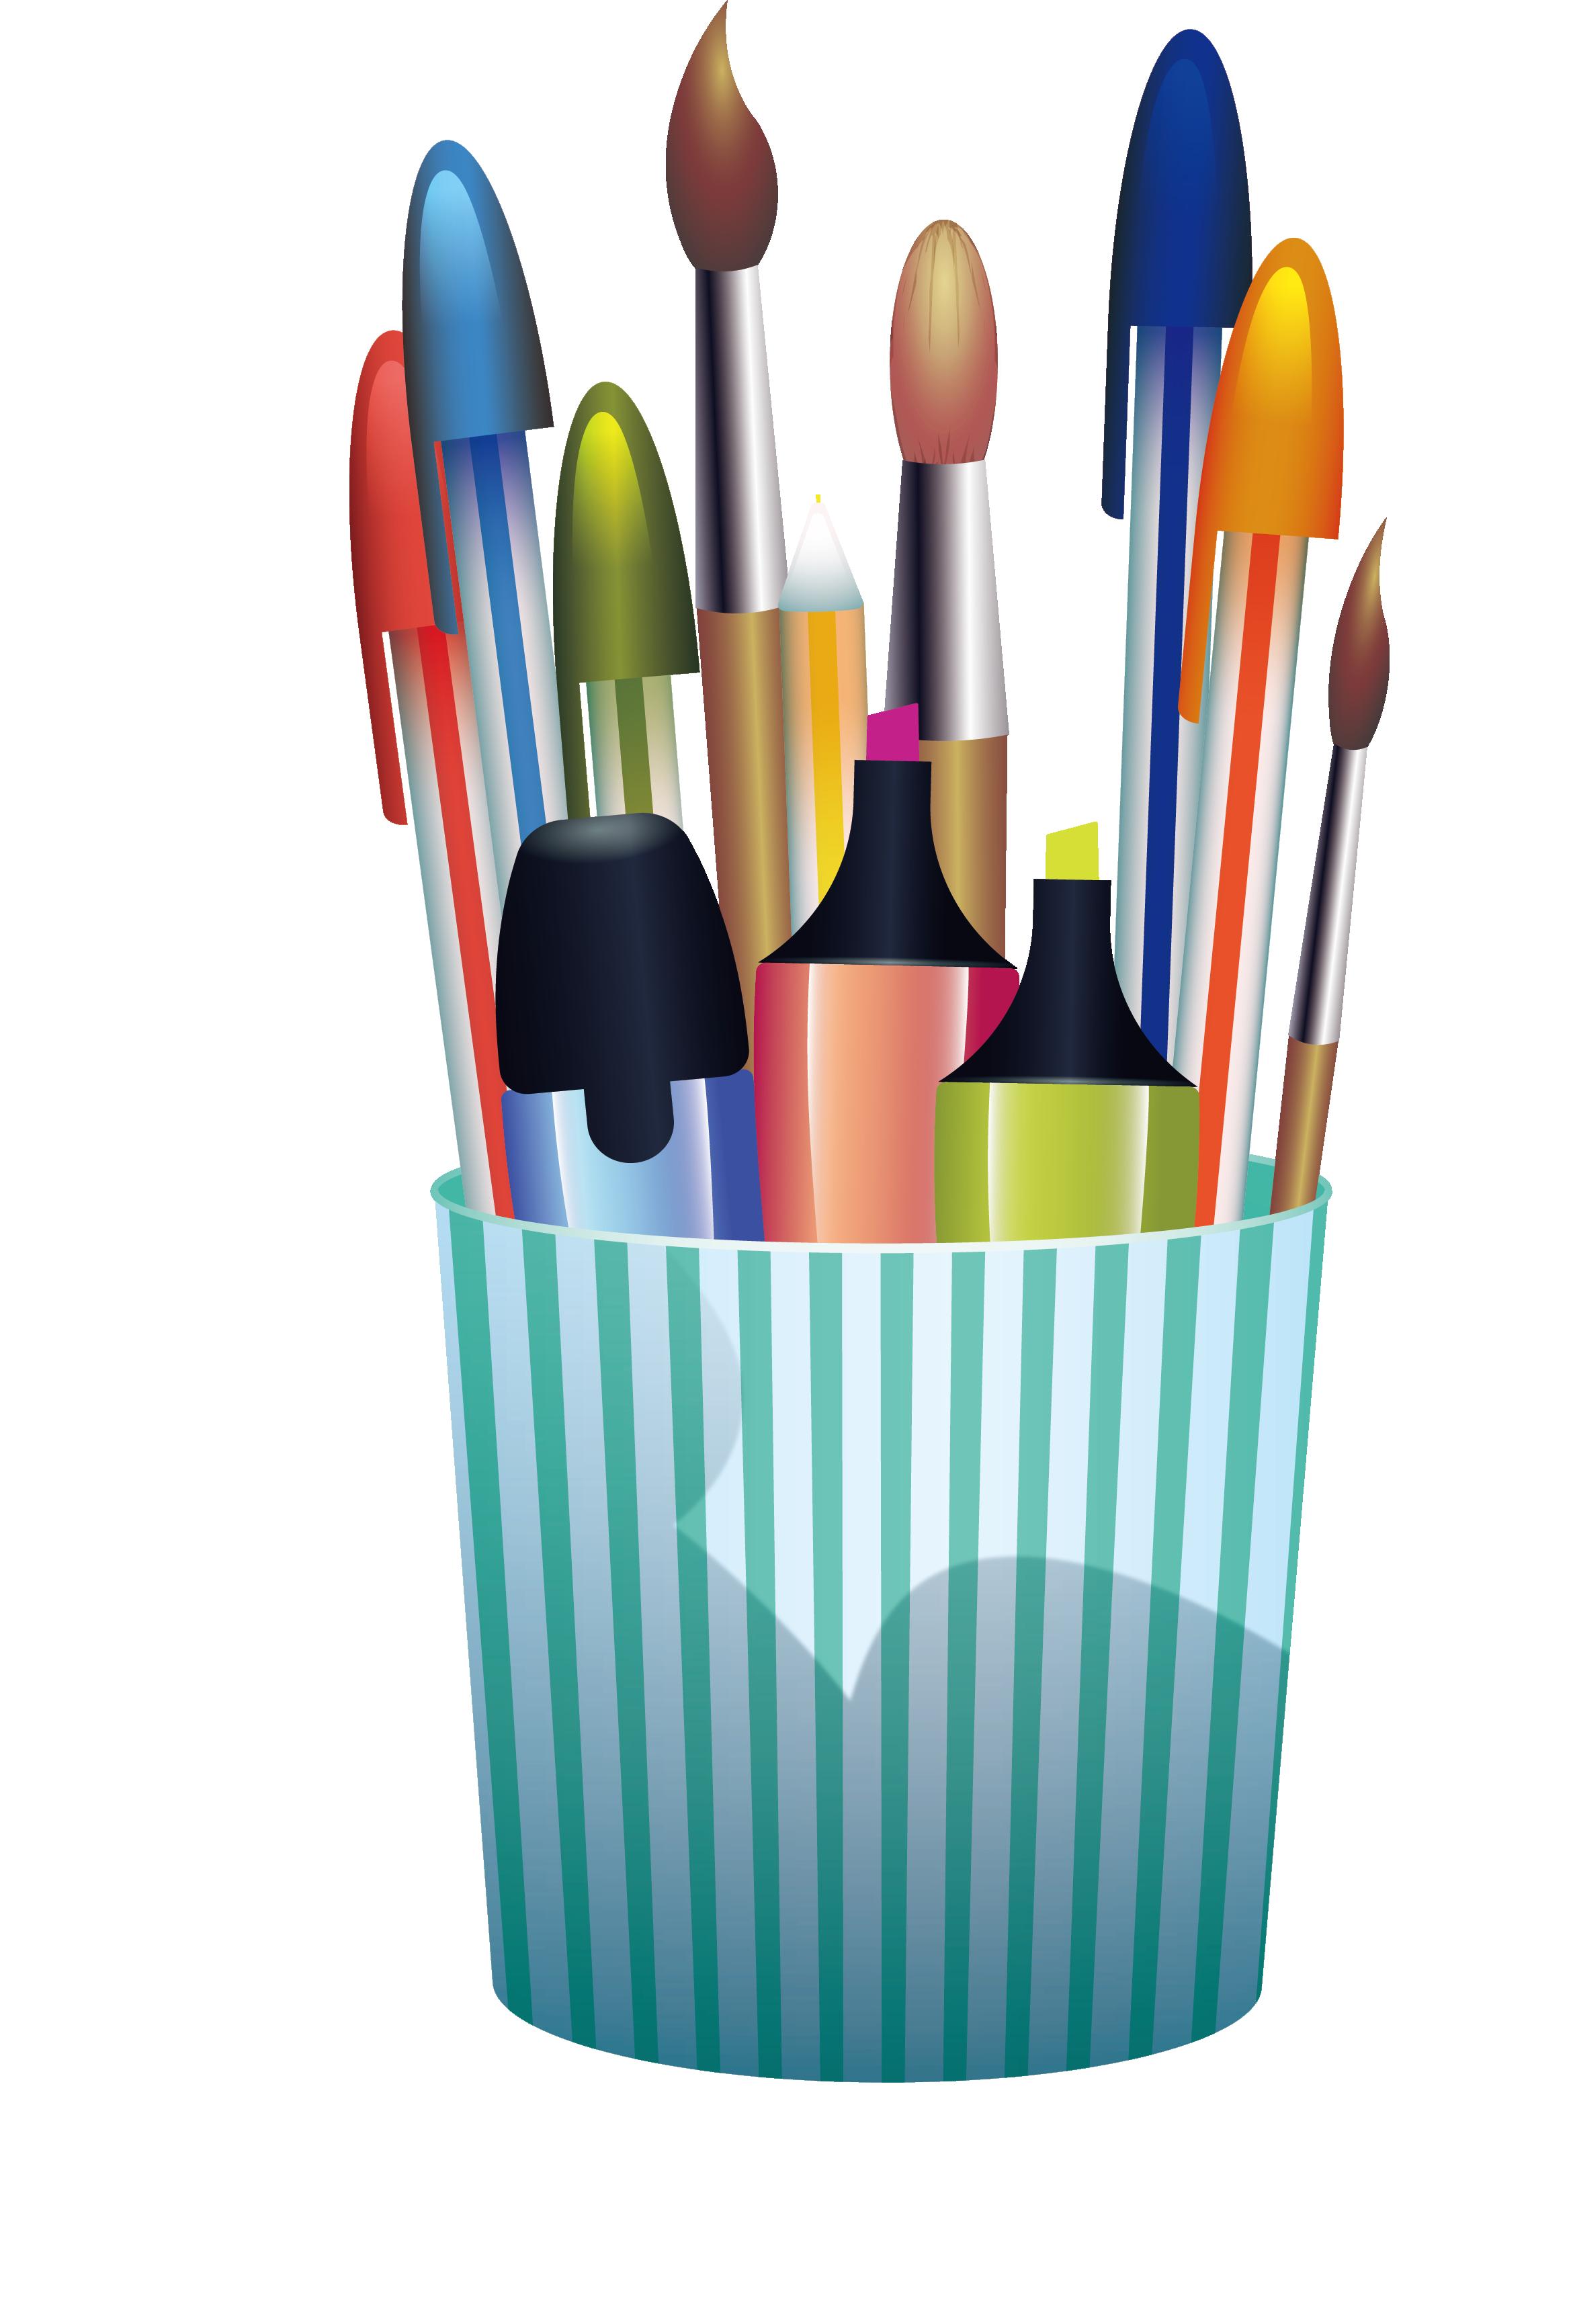 Pencil clipart pen. Clip art green stripe